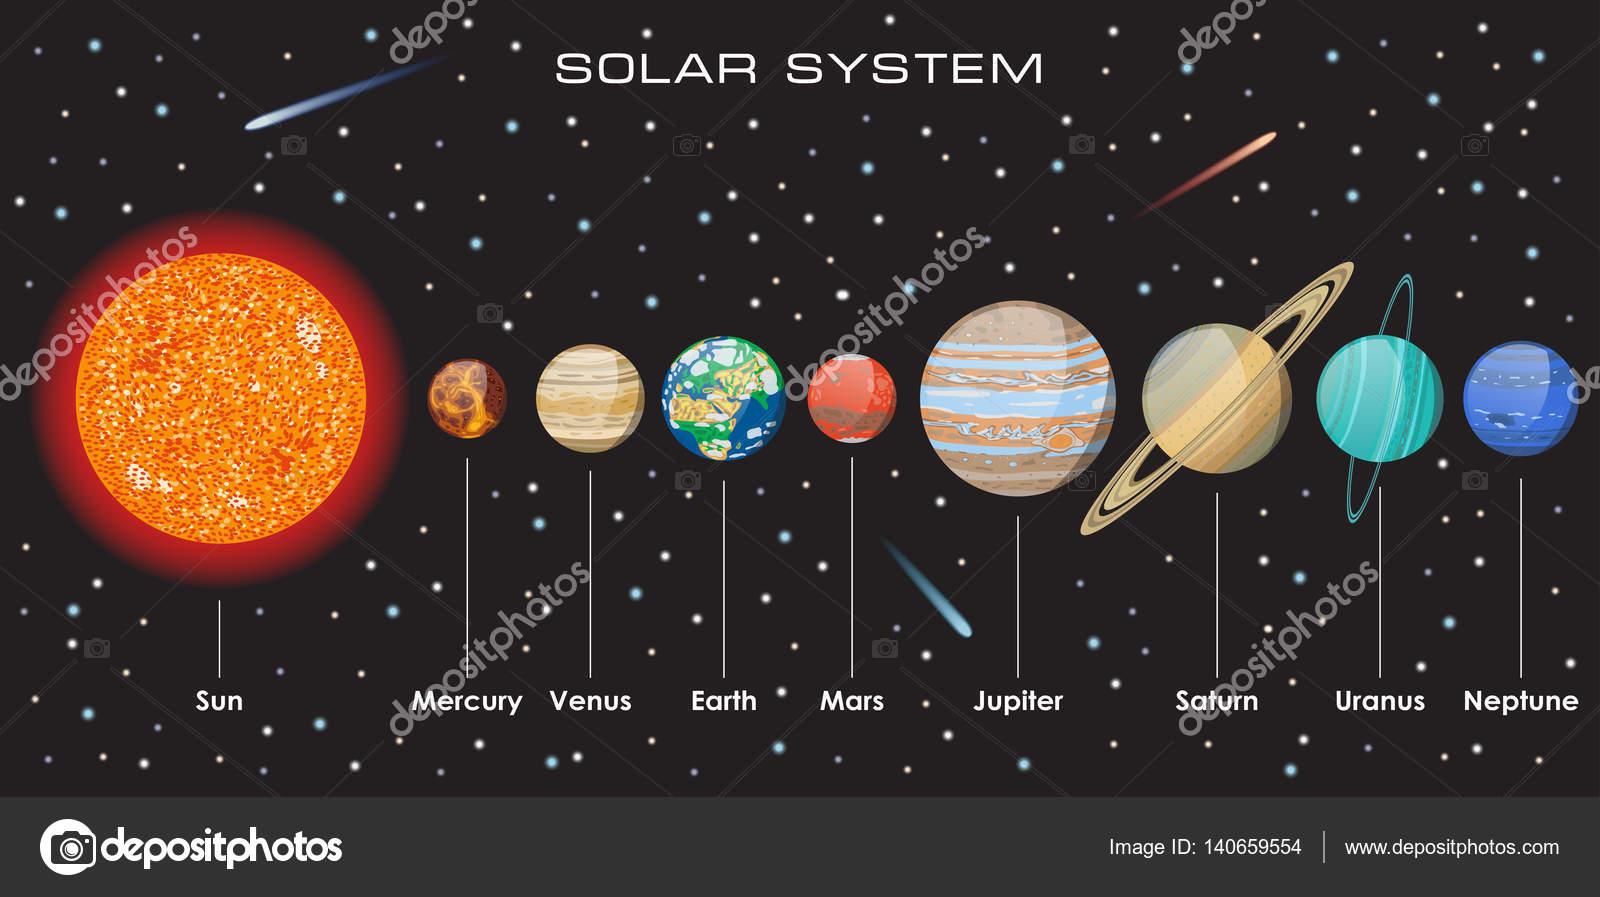 solar system vector - photo #34